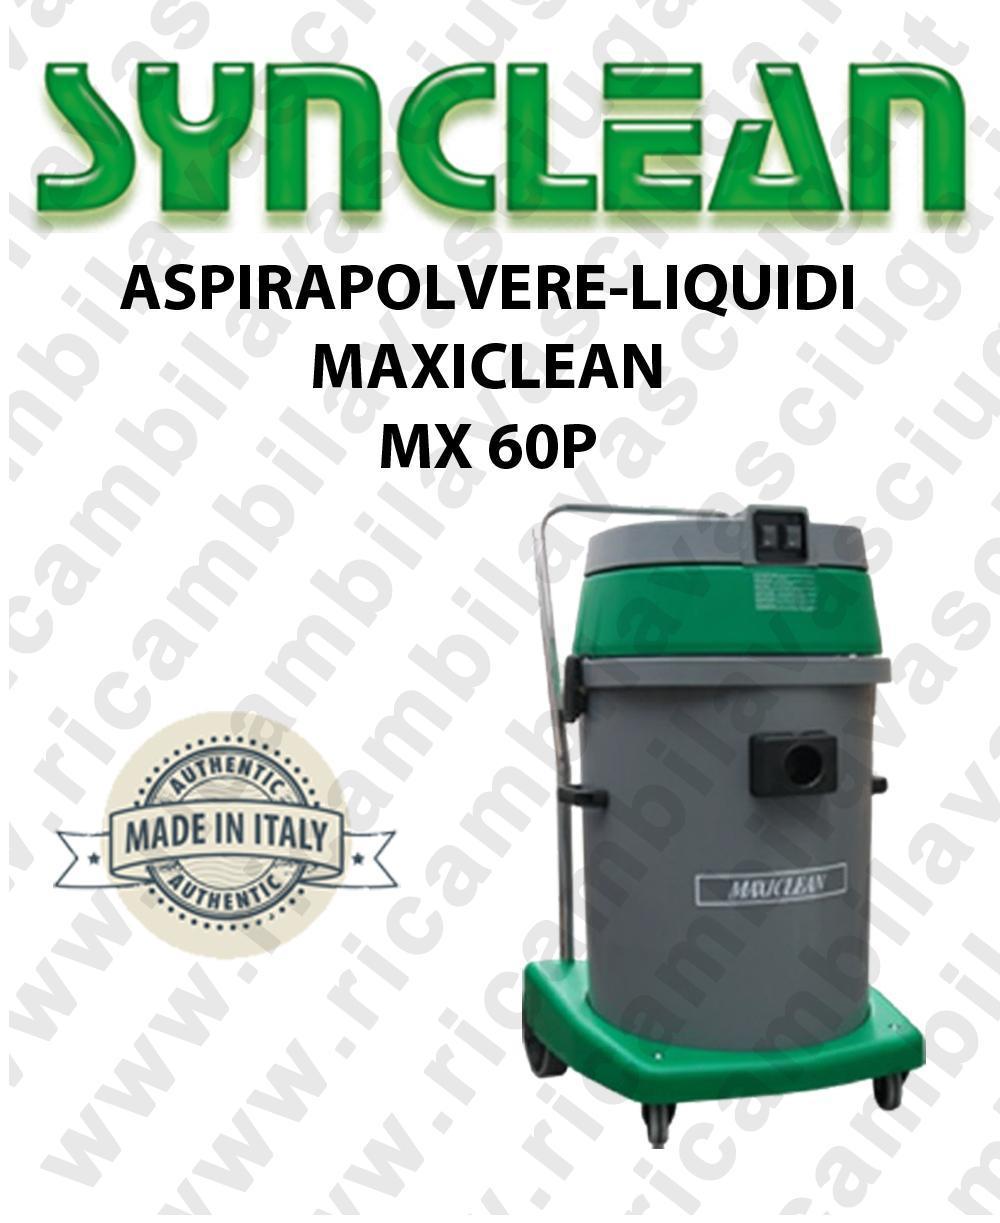 MAXICLEAN MX 60P aspiradora aspiraliquidi SYNCLEAN